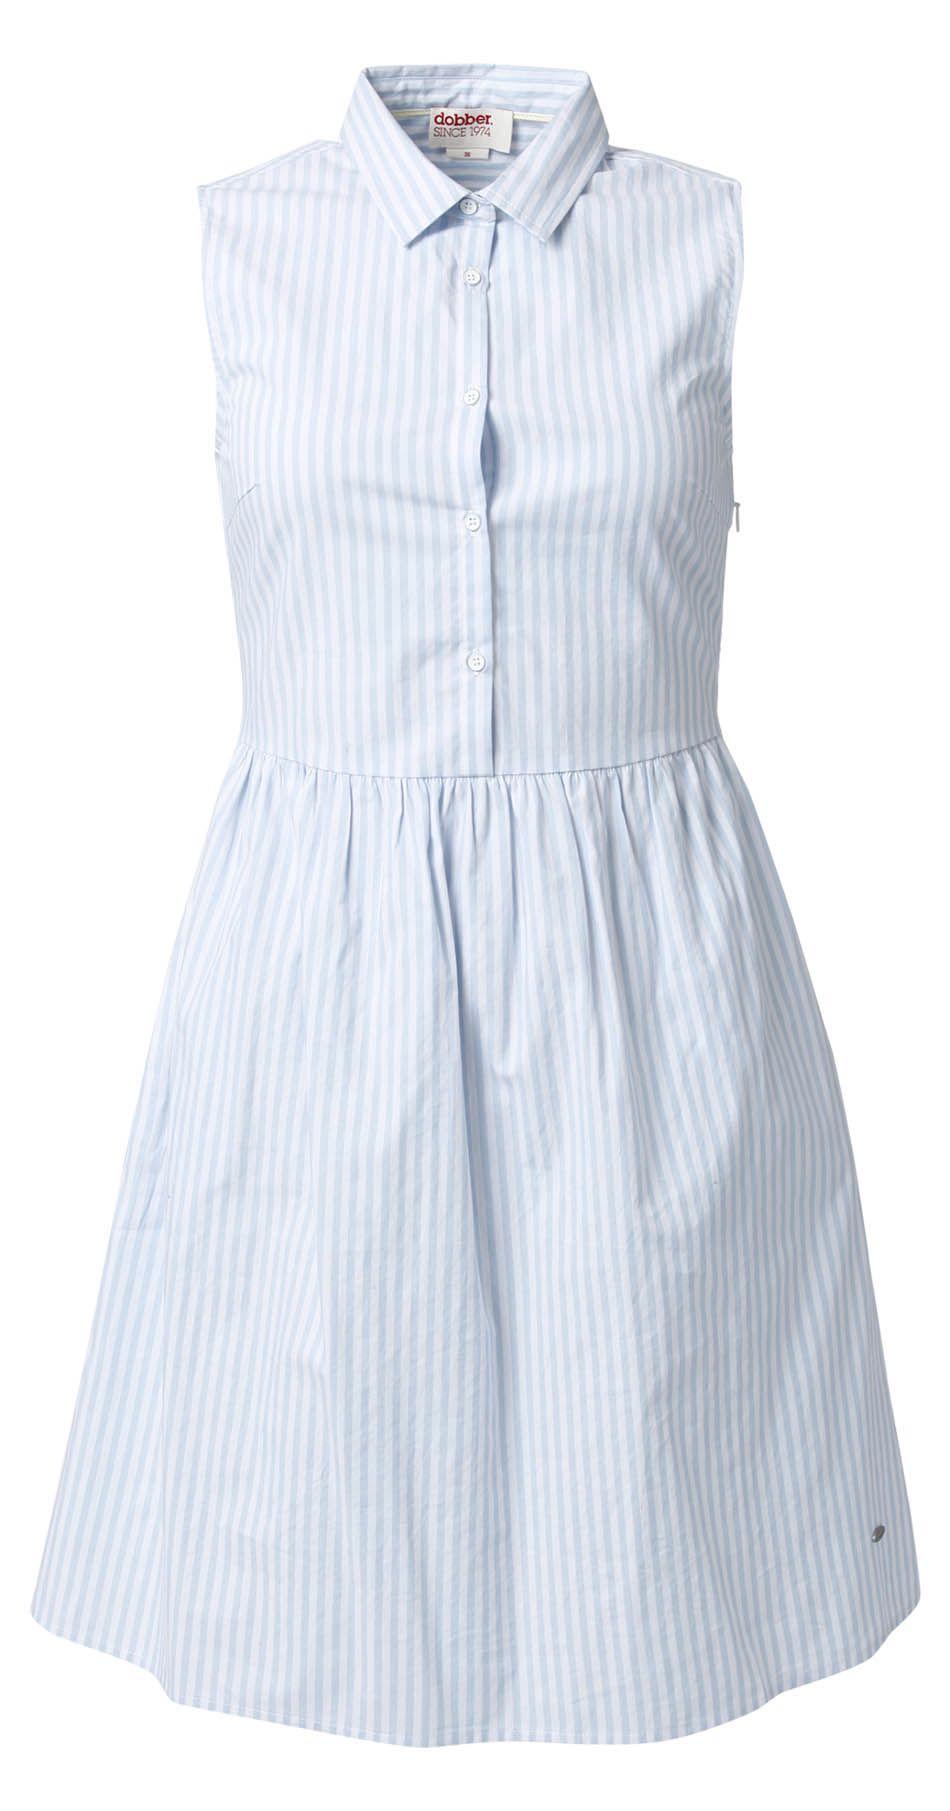 Chloé dress Dobber | Vestidos